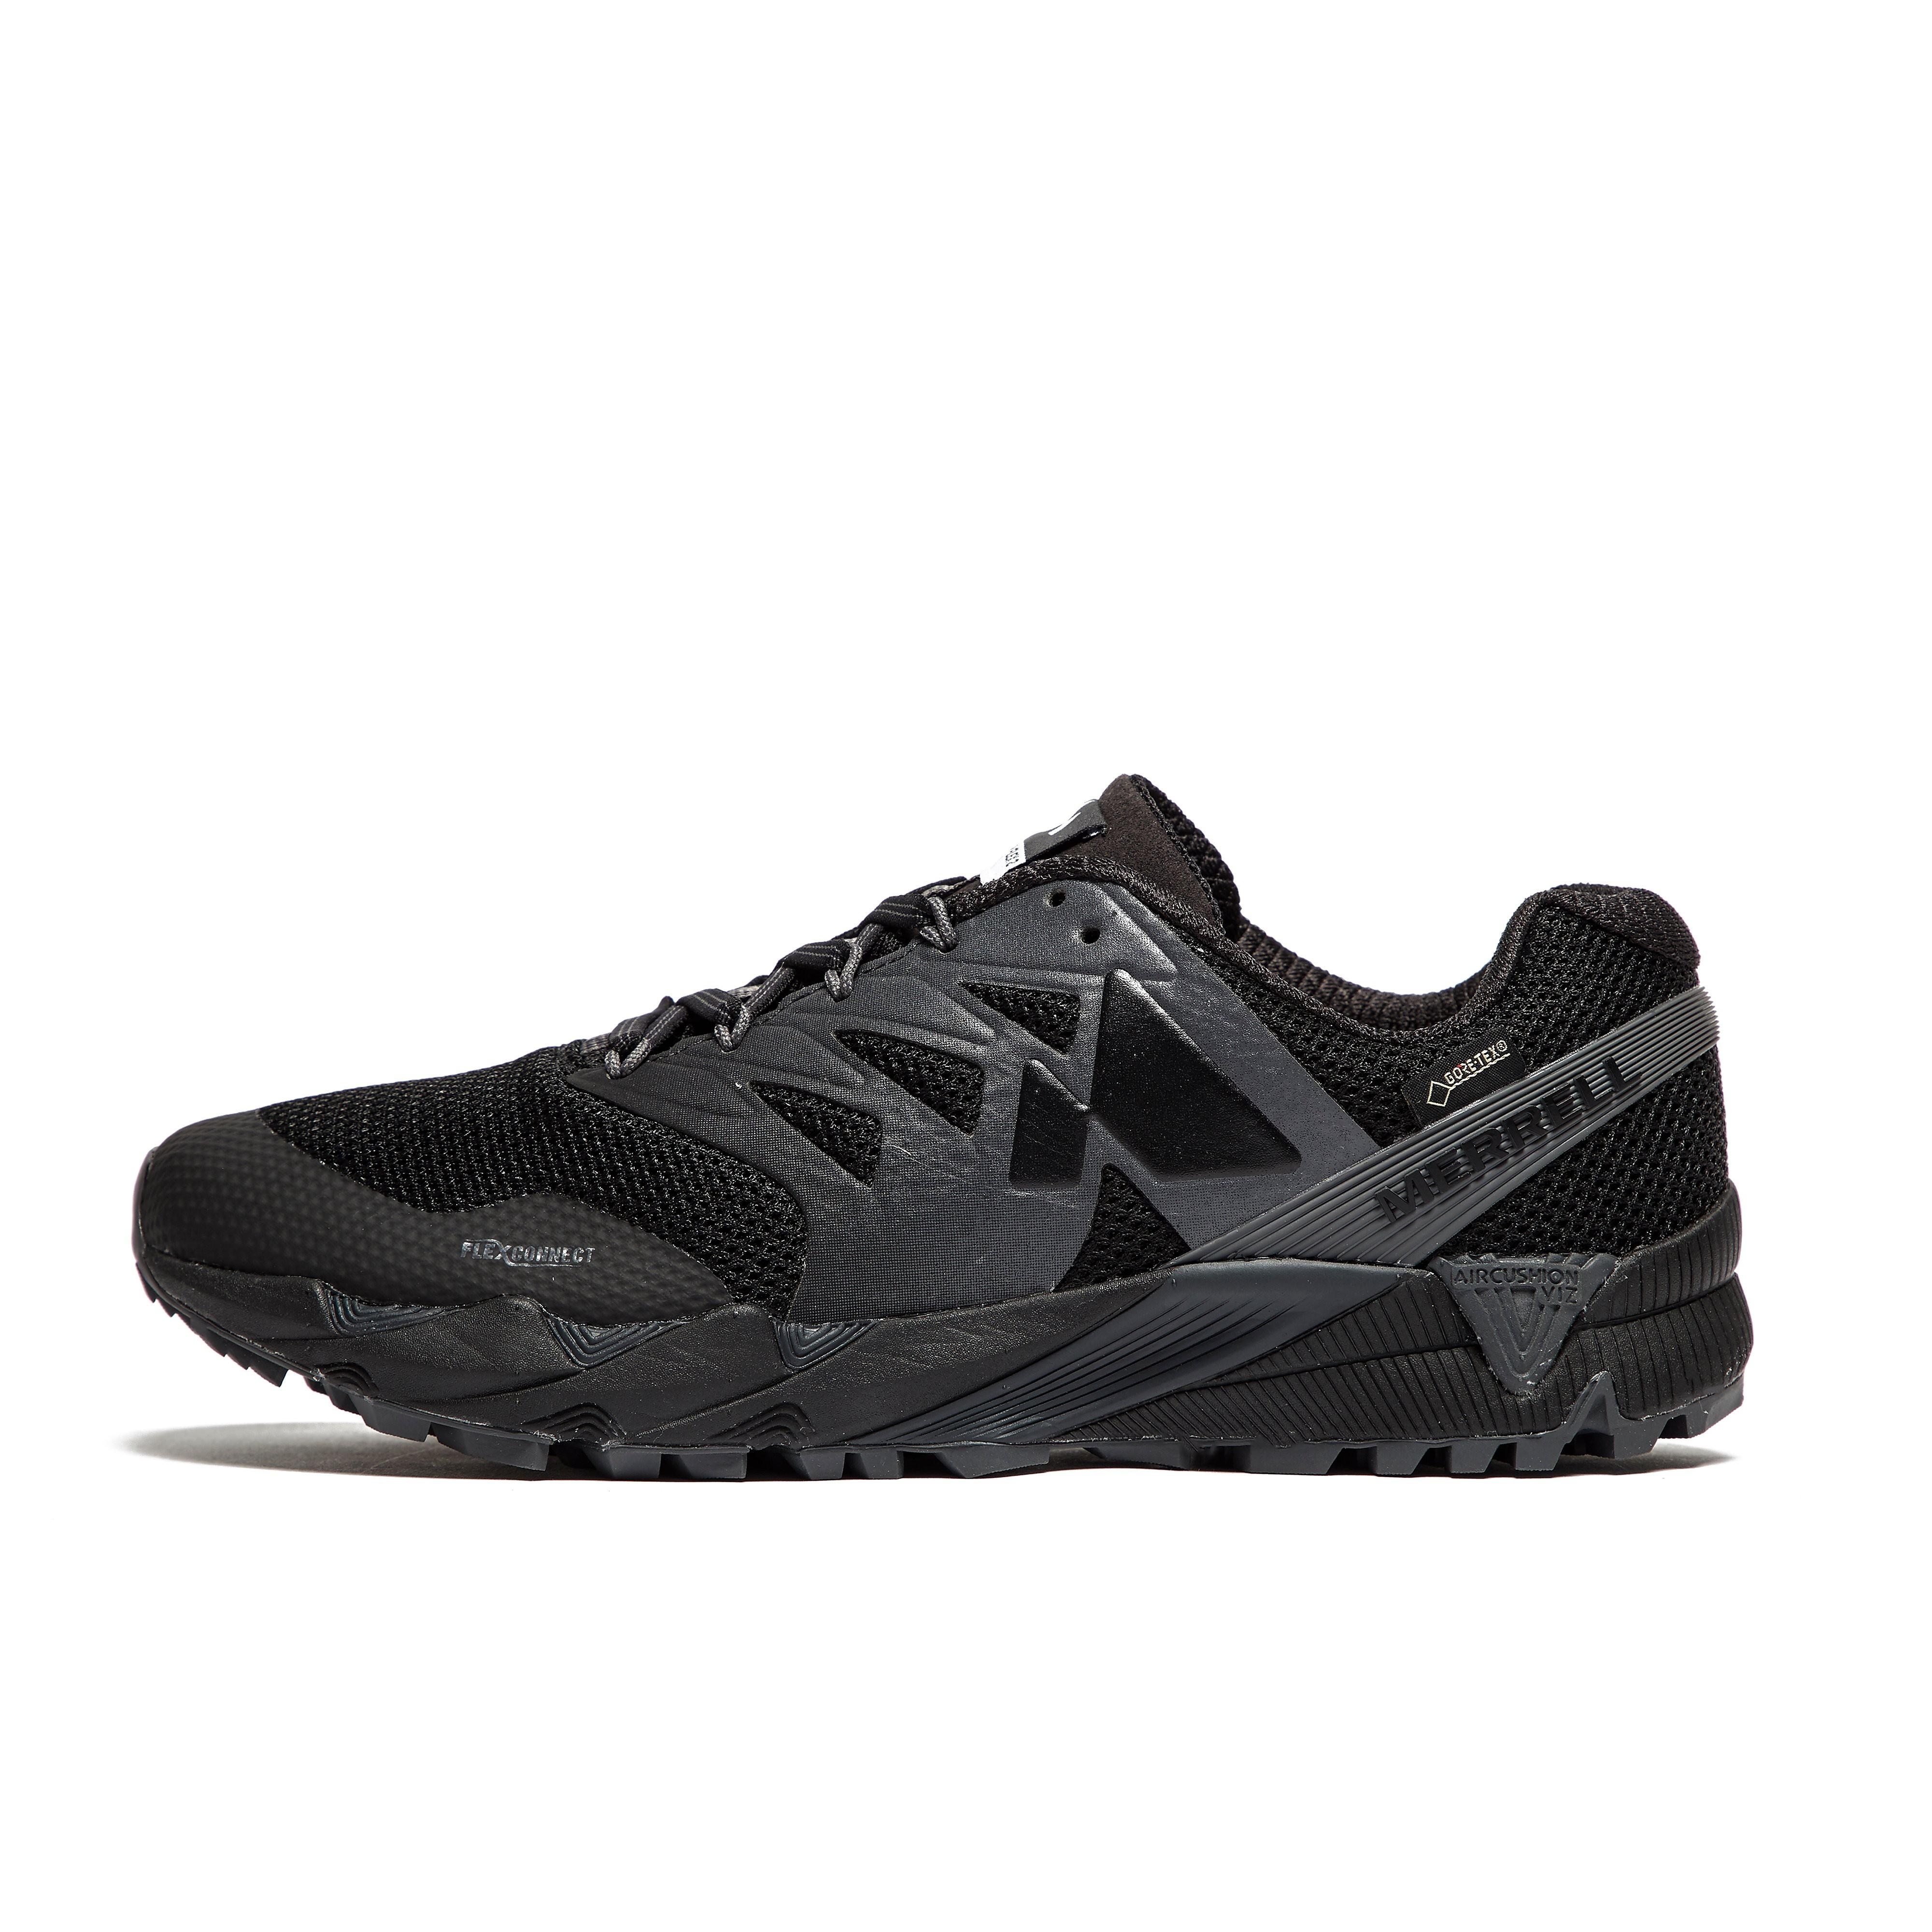 Merrell Agility Peak GTX Flex 2 Men's Trail Running Shoe